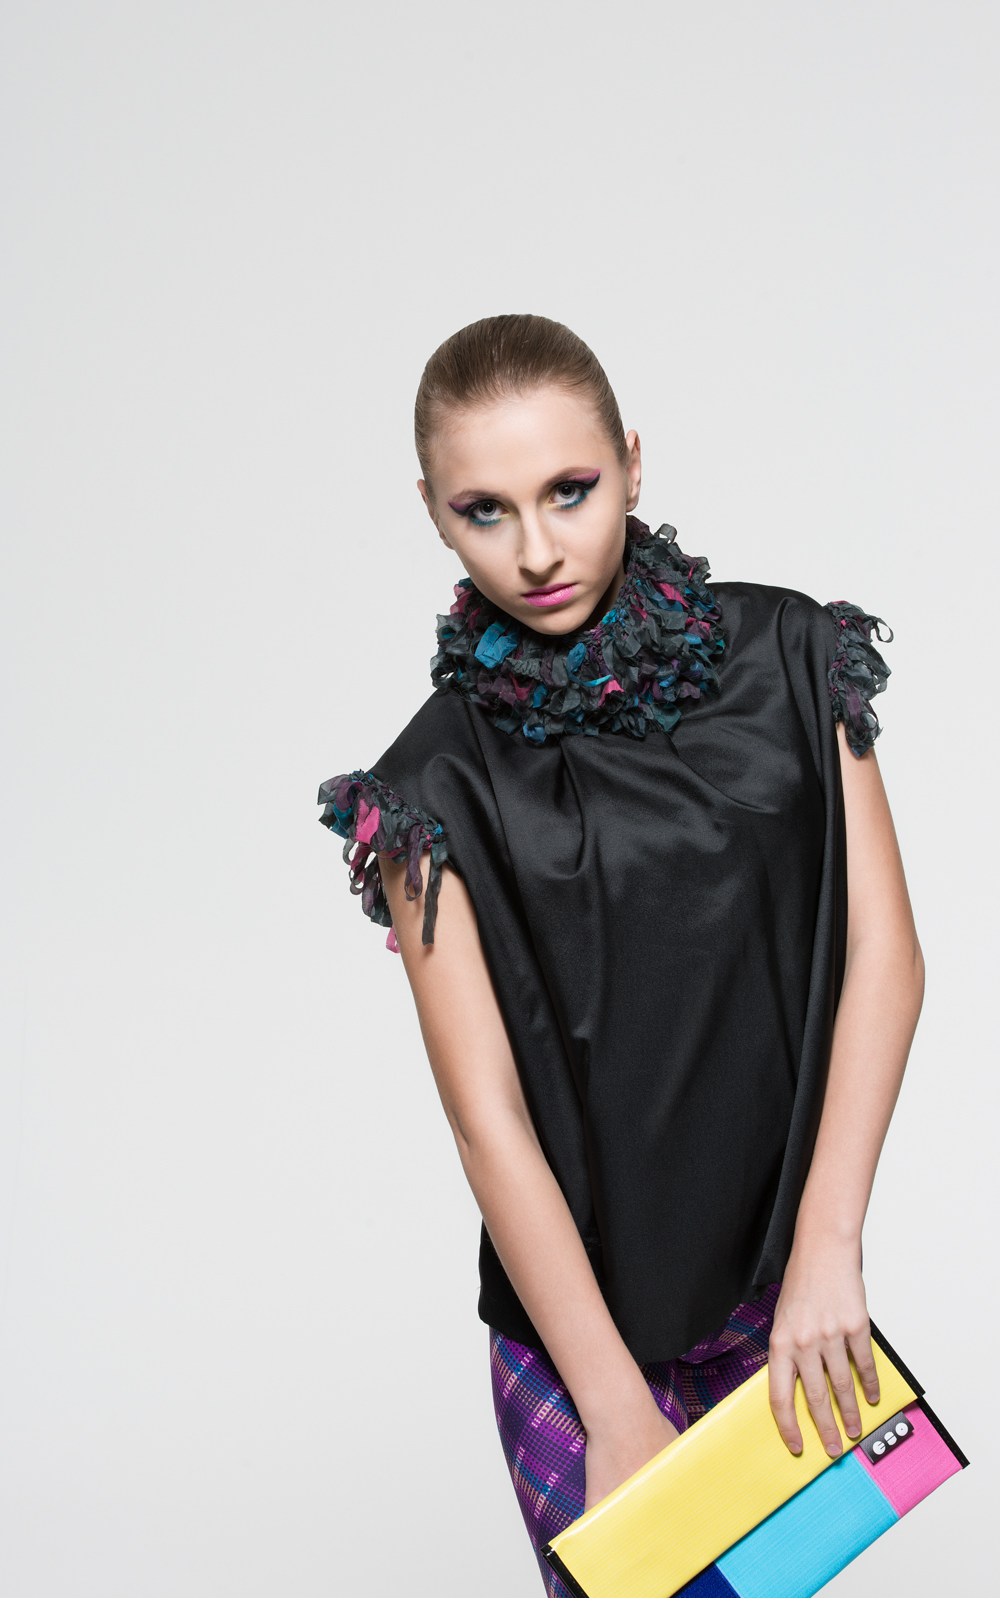 Blouse: Carla Cixi Crocheting // Clutch: ECO Project // Model: Nathalie // MUA: Diana Guti // Foto & Retouch: Sebastian Kreinau